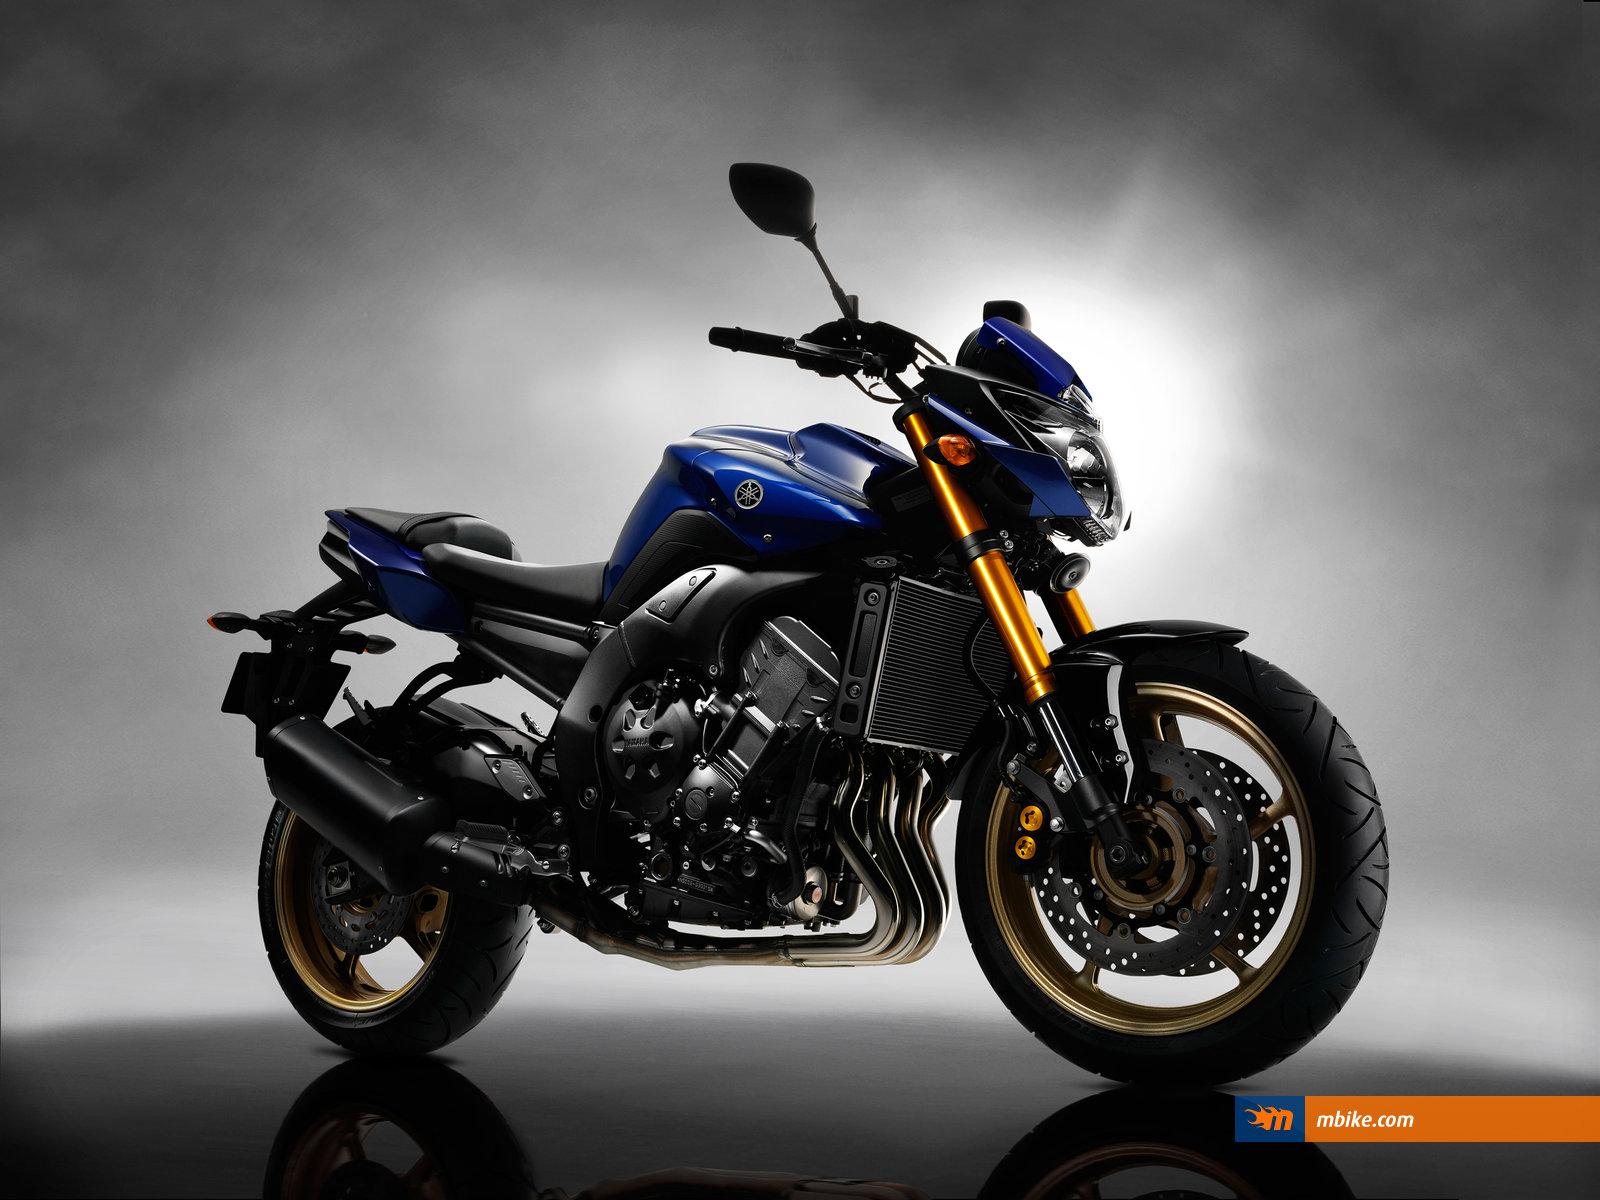 2010 Yamaha FZ8 FZ8N Wallpaper   Mbikecom 1600x1200